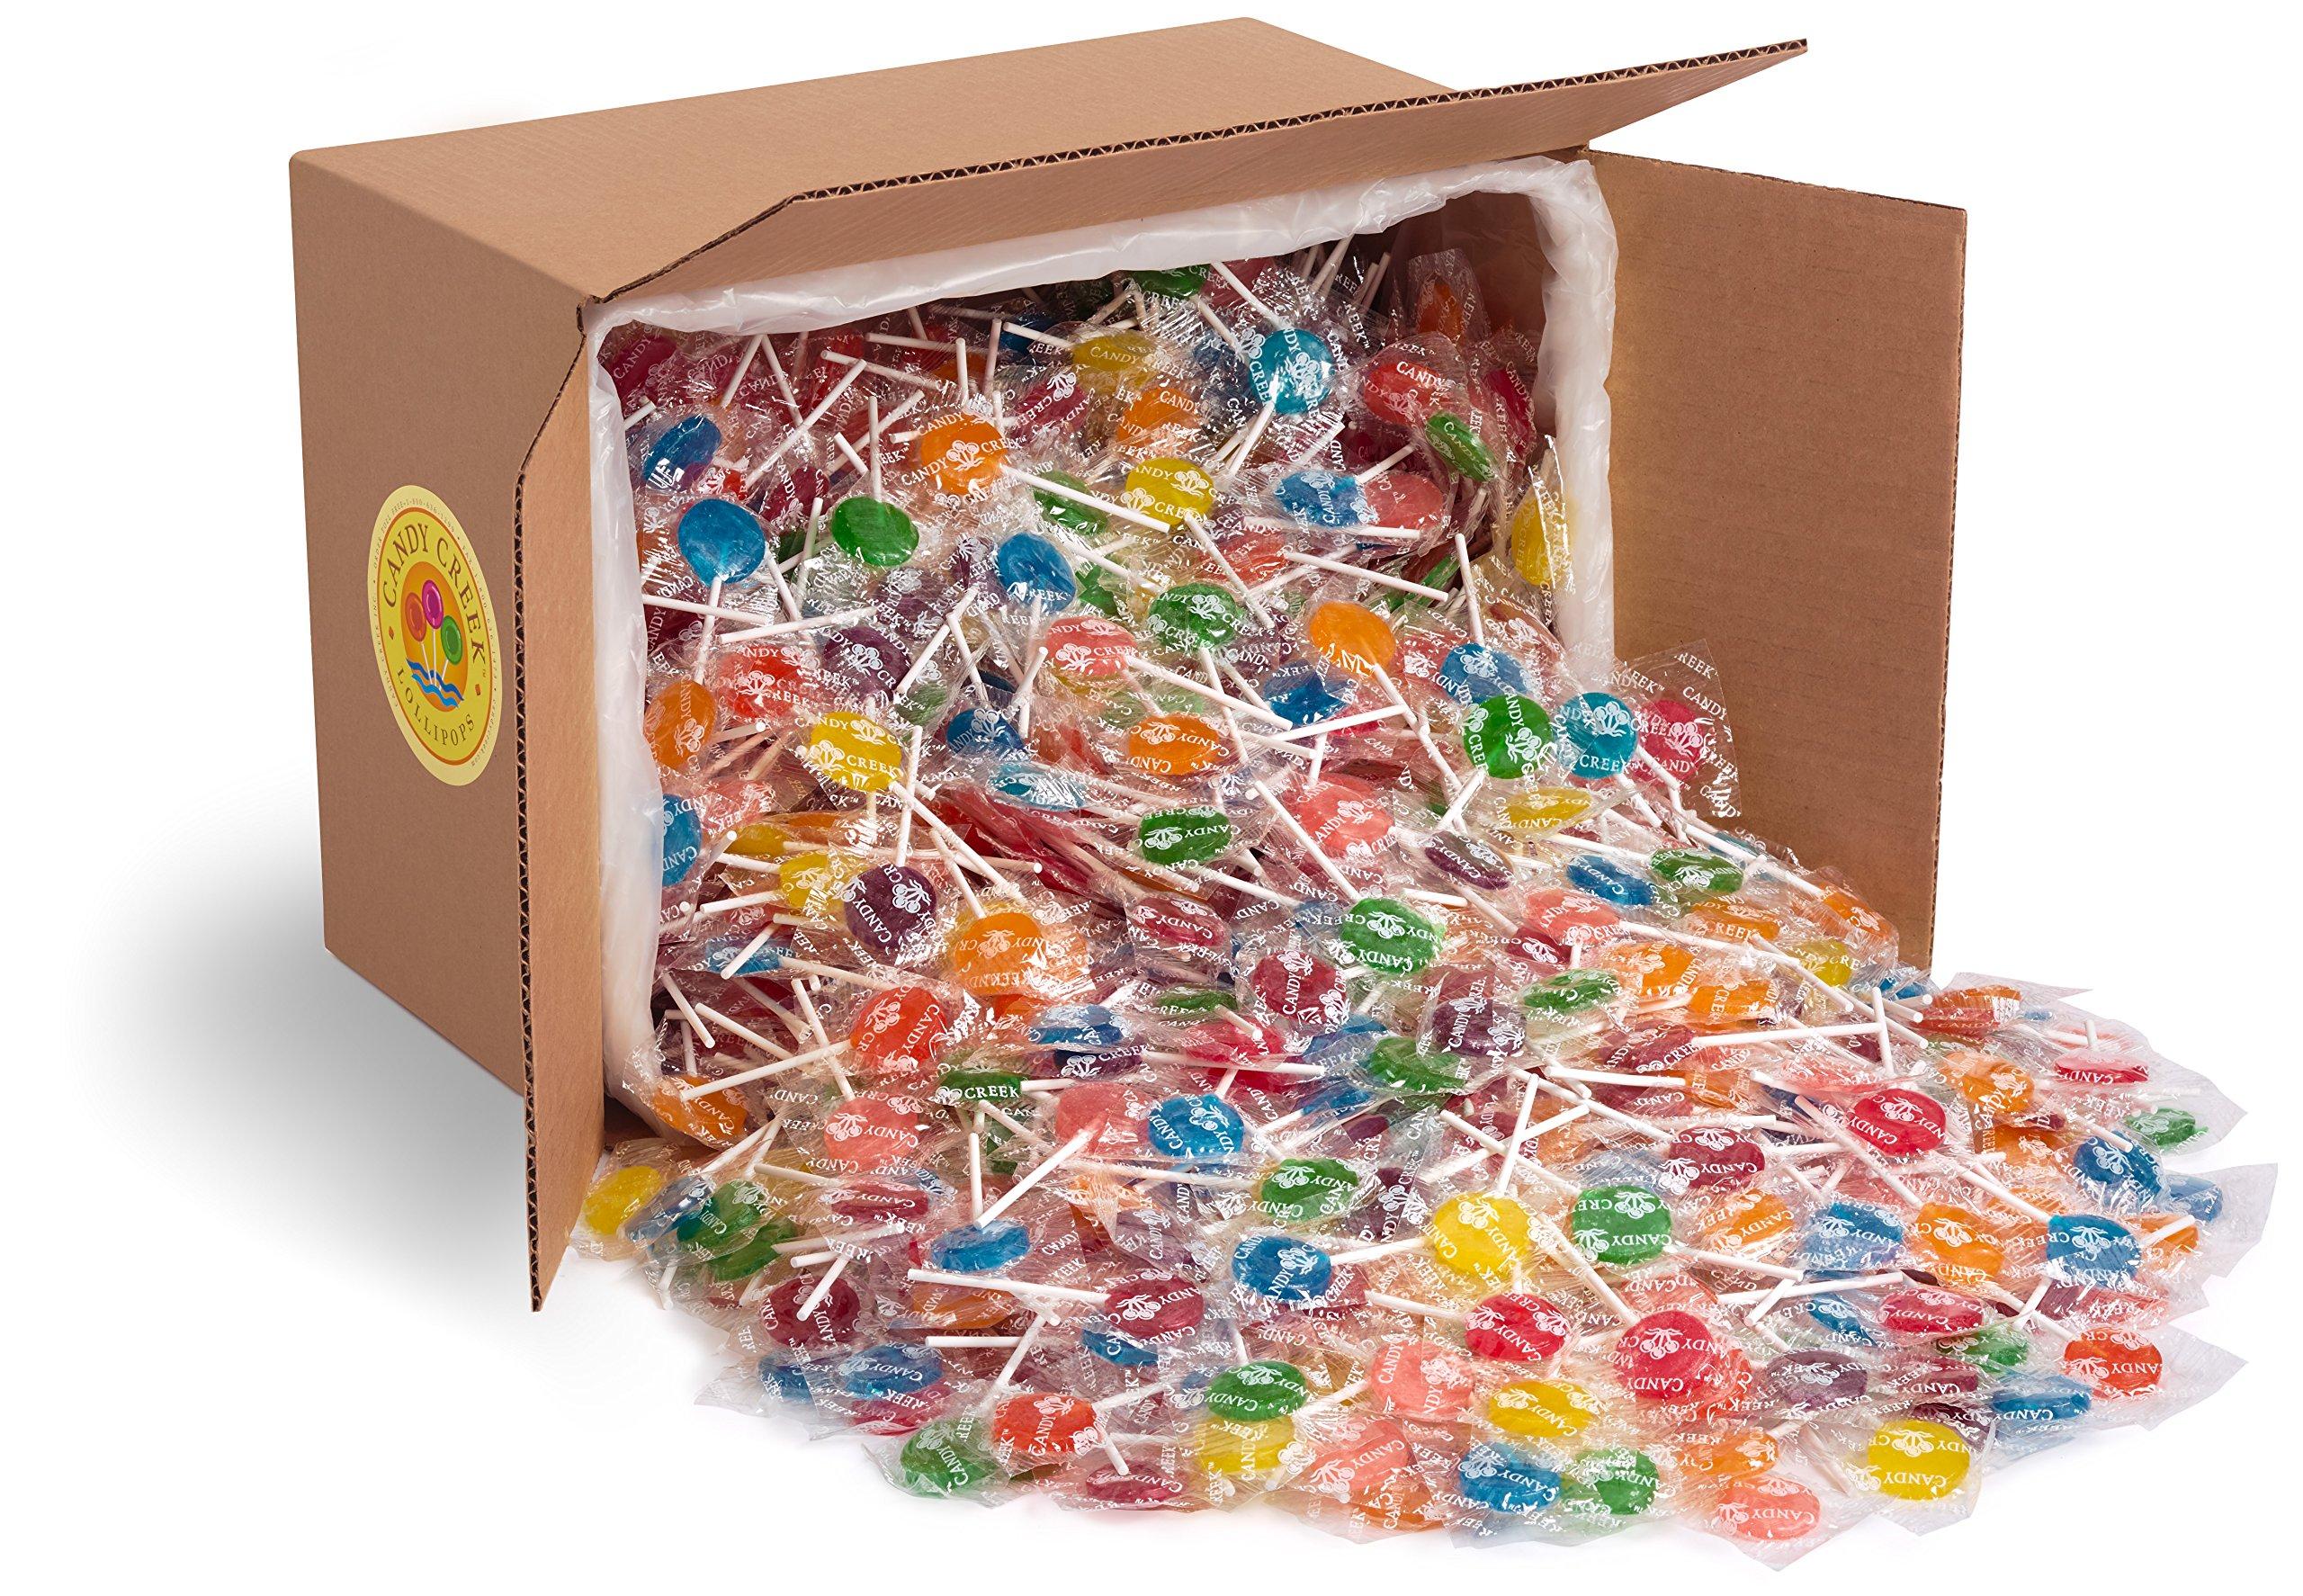 Candy Creek Fruit Lollipops, 18 pound Carton, Bulk Candy, Assorted Flavors